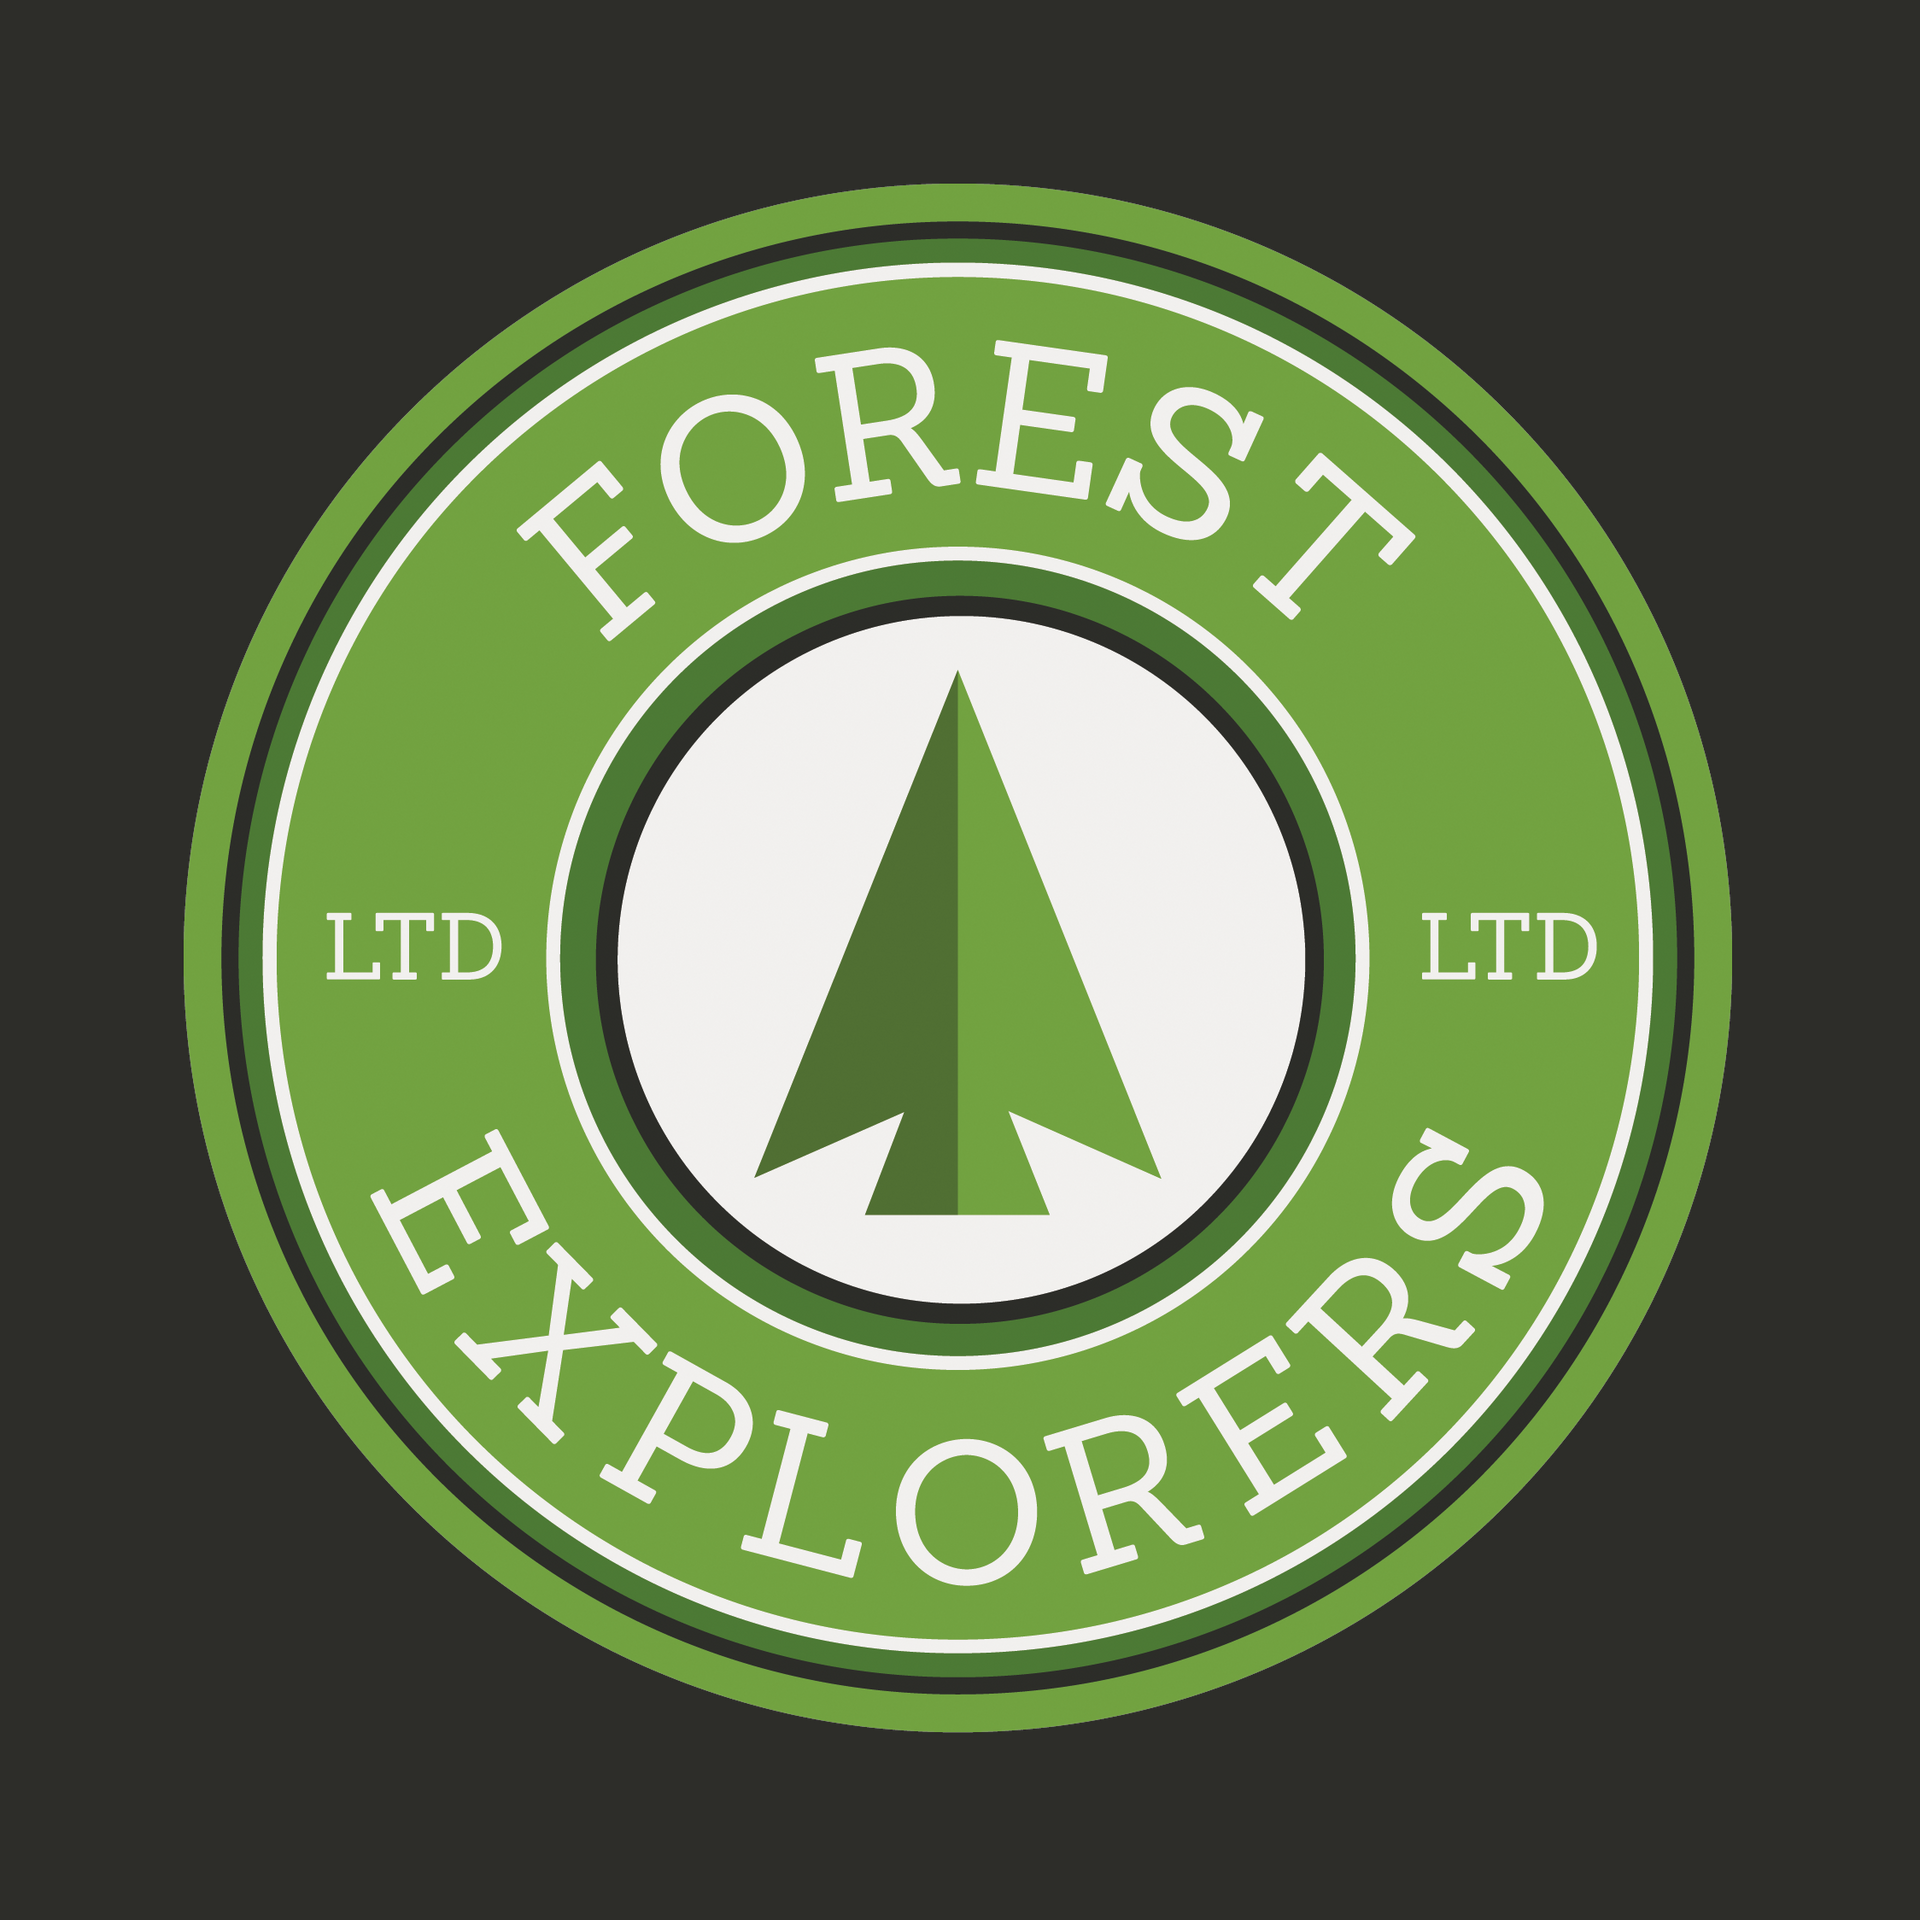 FINAL FOREST EXPLORERS copy.png